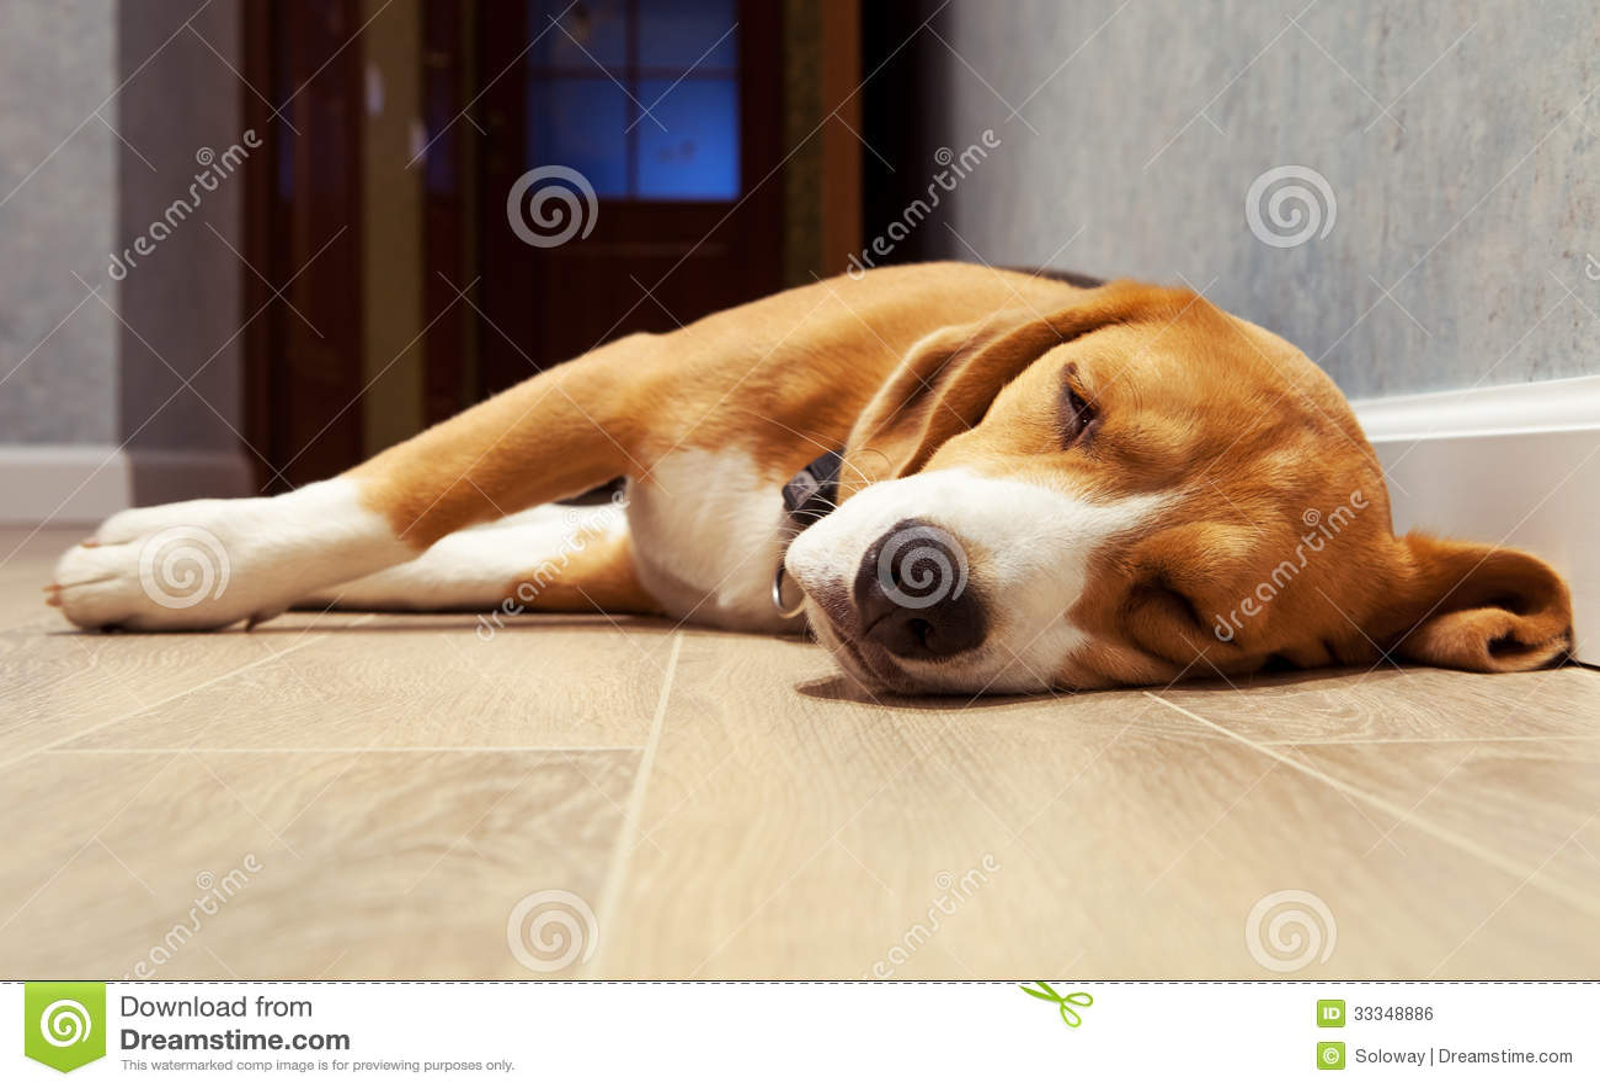 Sleeping Beagle Dog On The Wood Floor Royalty Free Stock